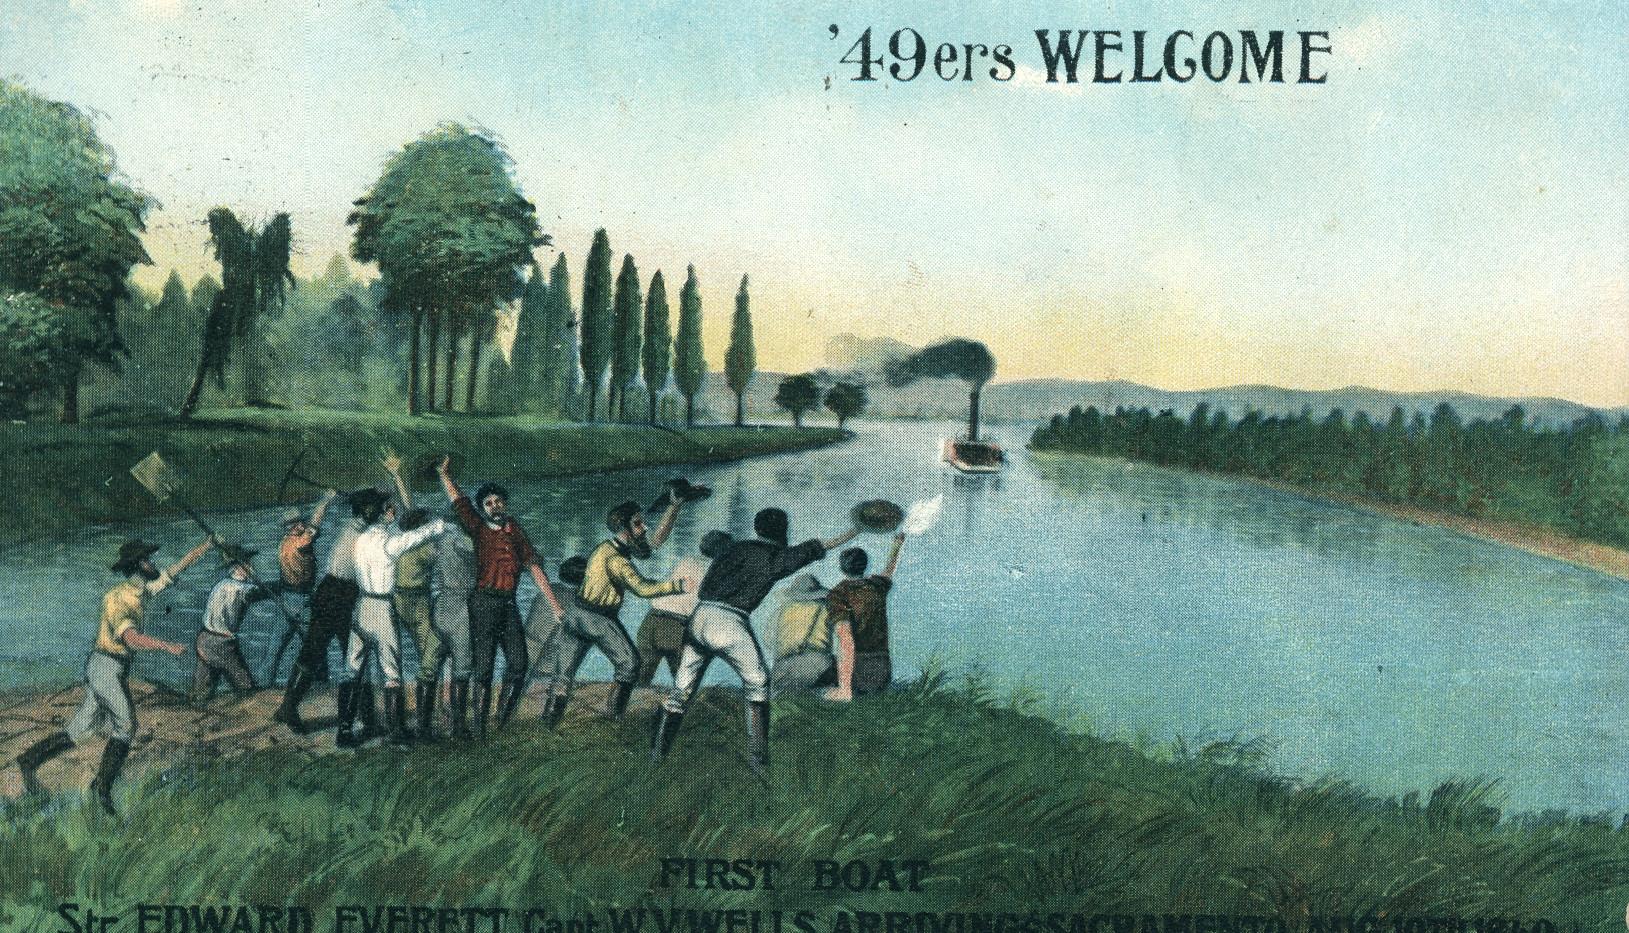 '49ers Welcome. Sacramento, California, 1849